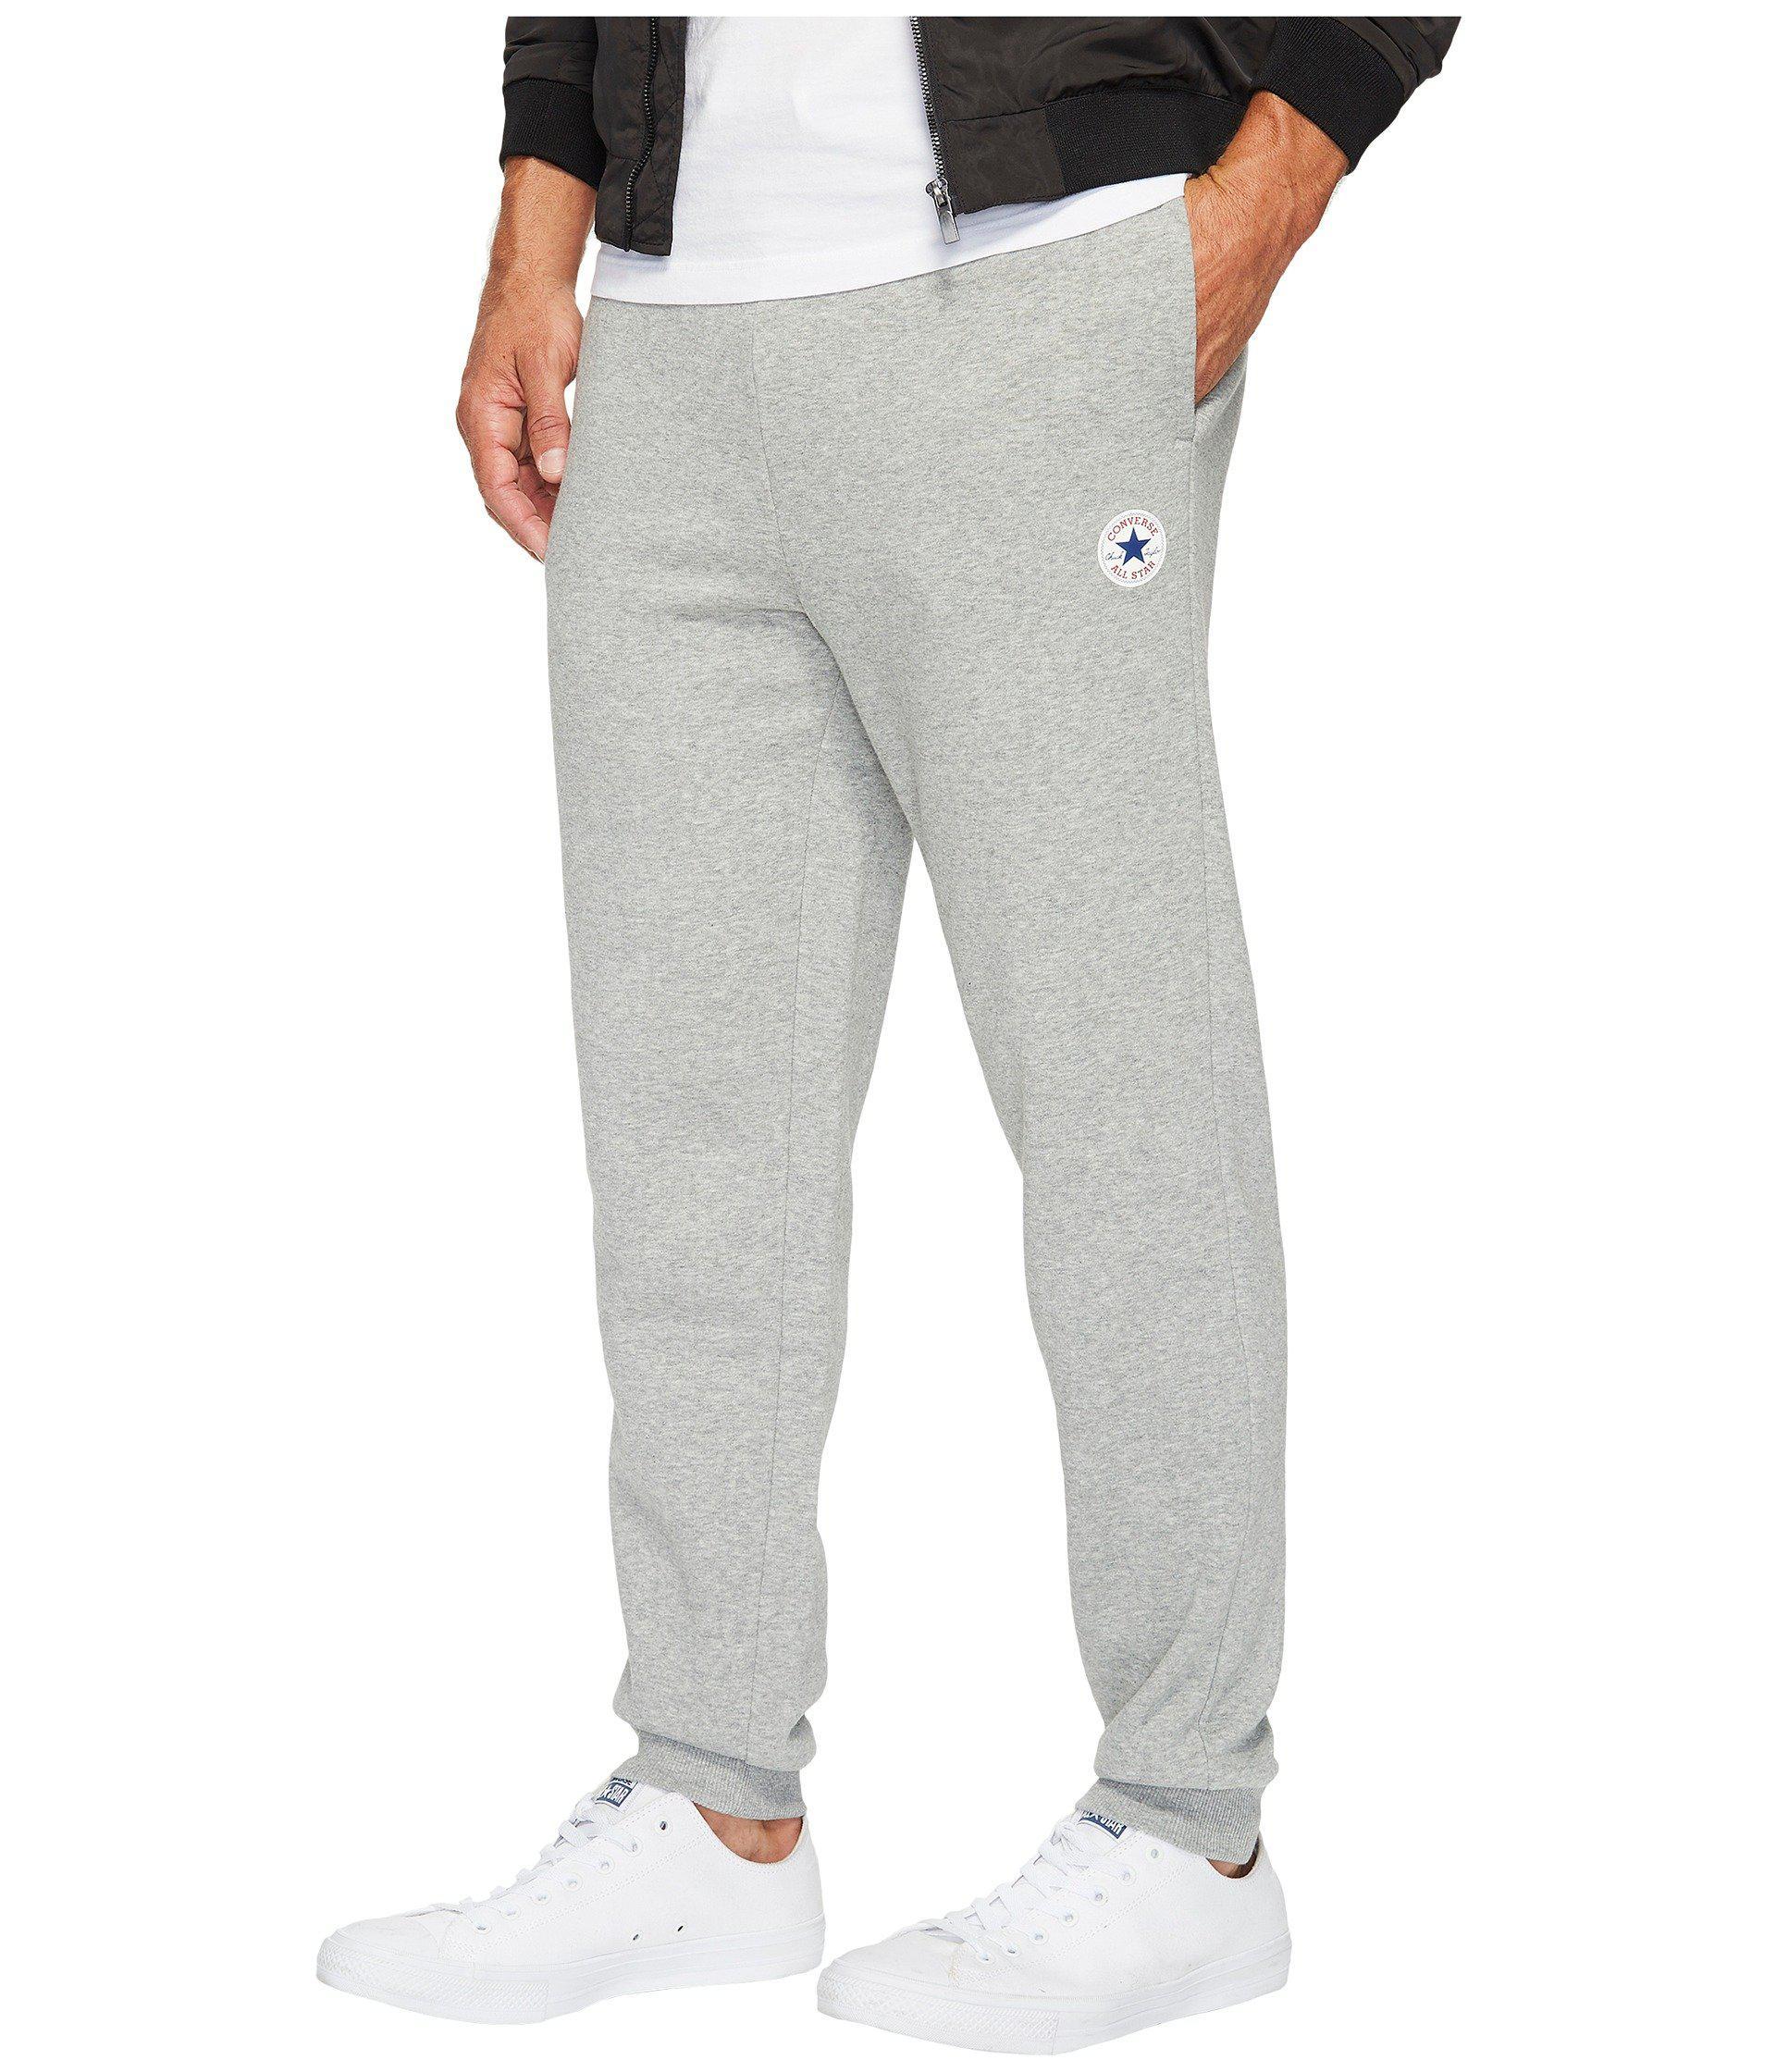 86d4dda9800920 Lyst - Converse Core Jogger in Gray for Men